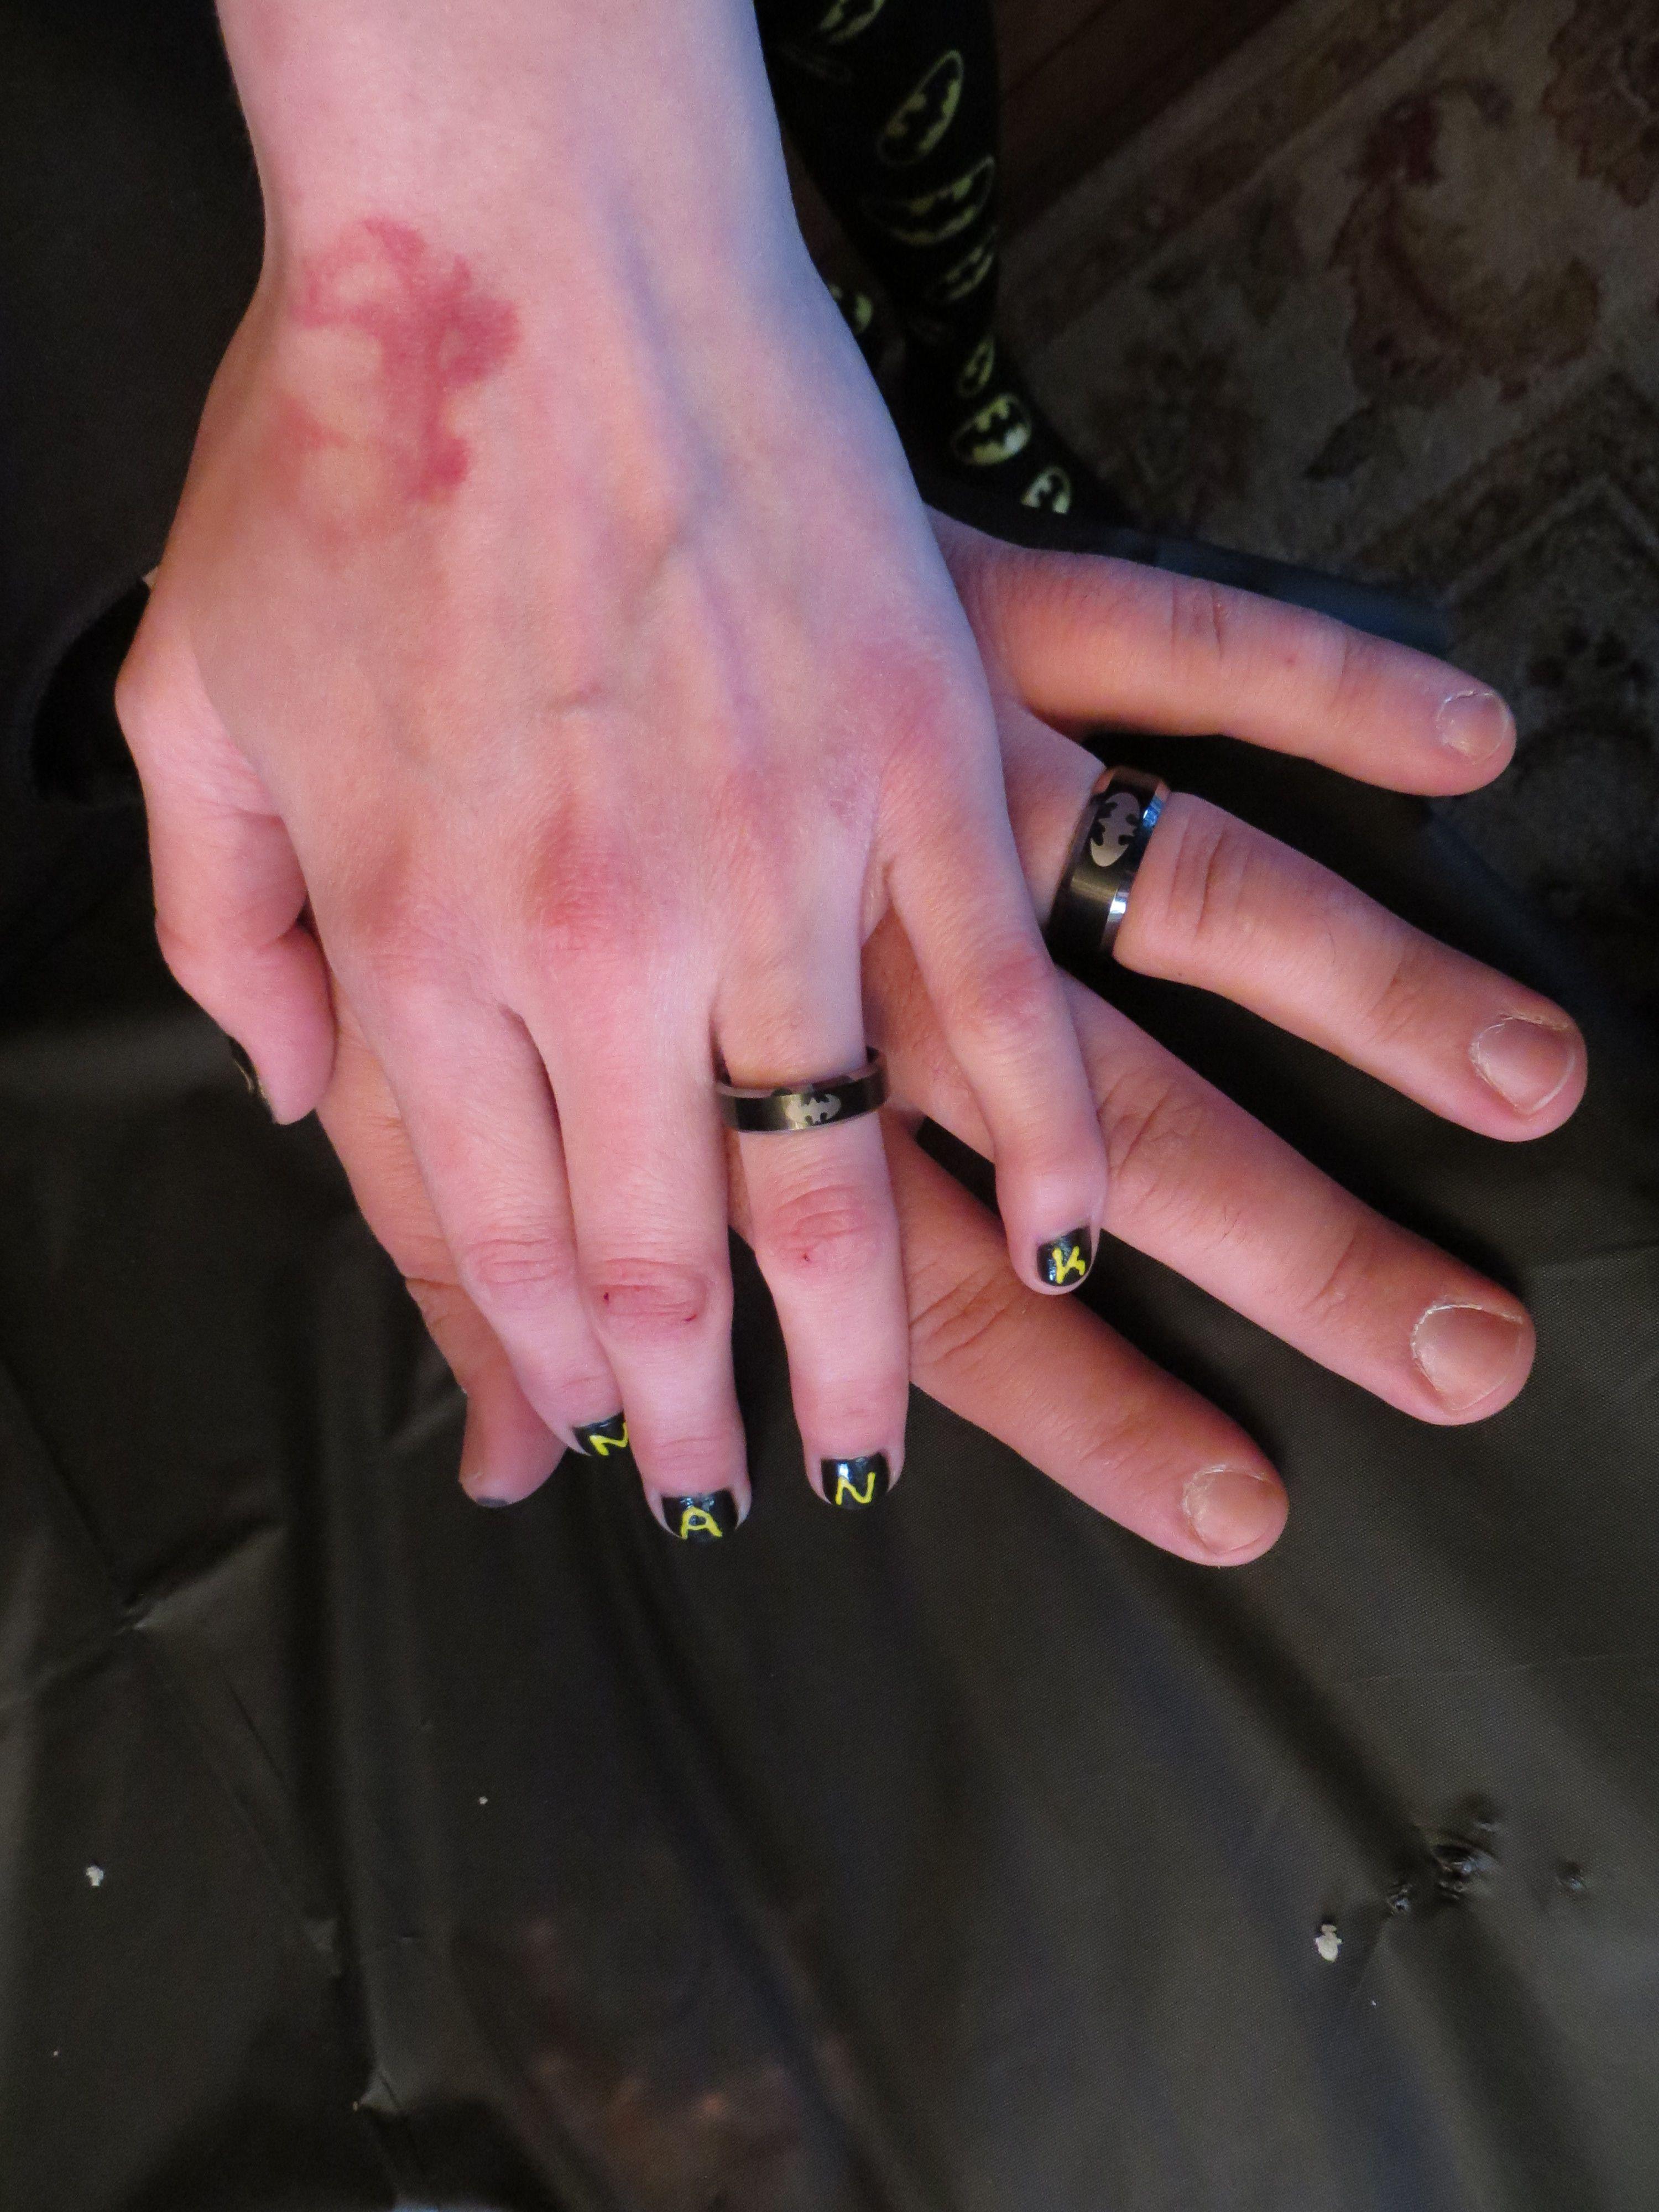 batman rings and the bride had black nails with the batman symbol ...